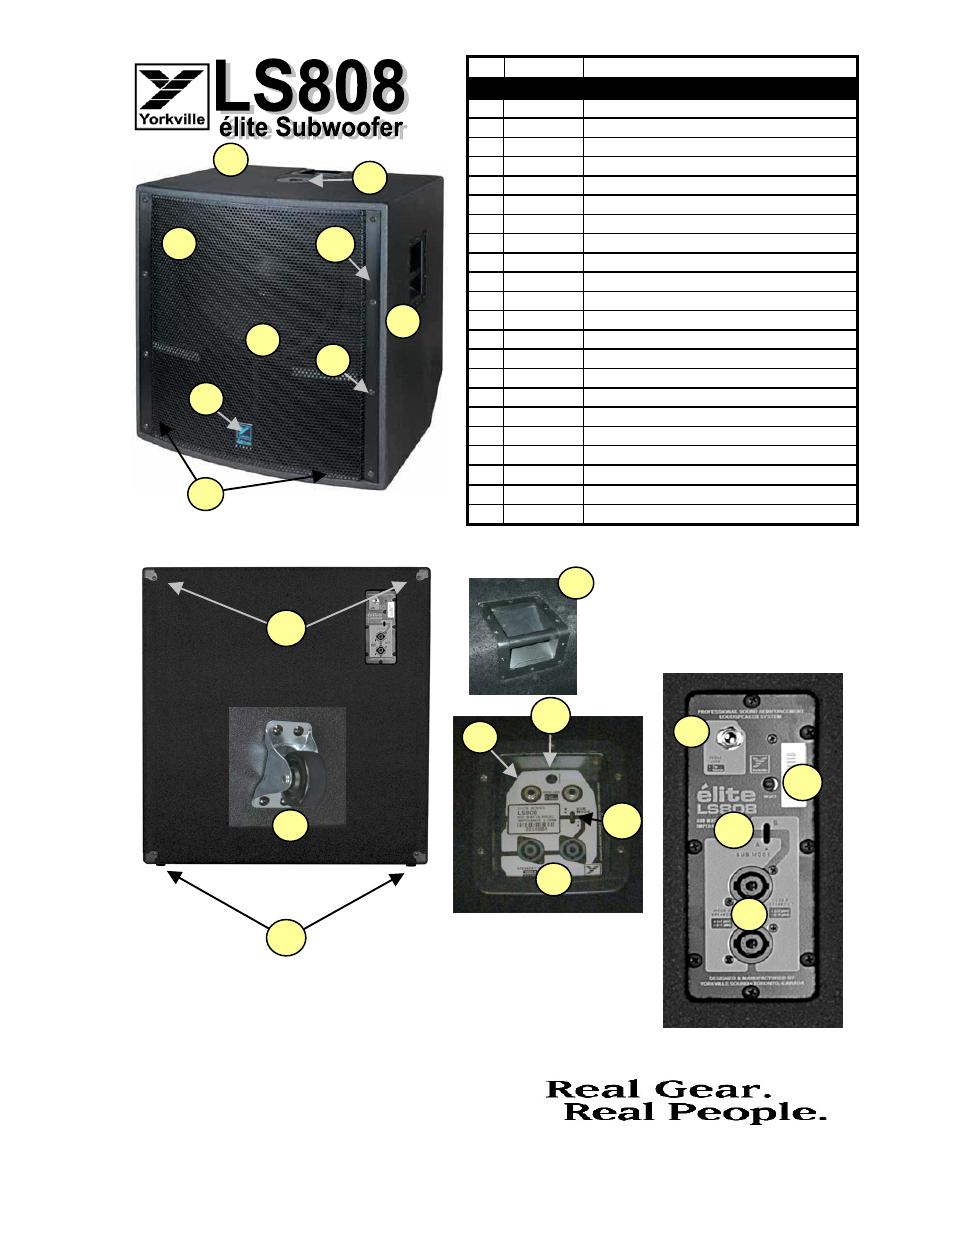 Parts Serv Ls808 1v0 Yorkville Ls2100p User Manual